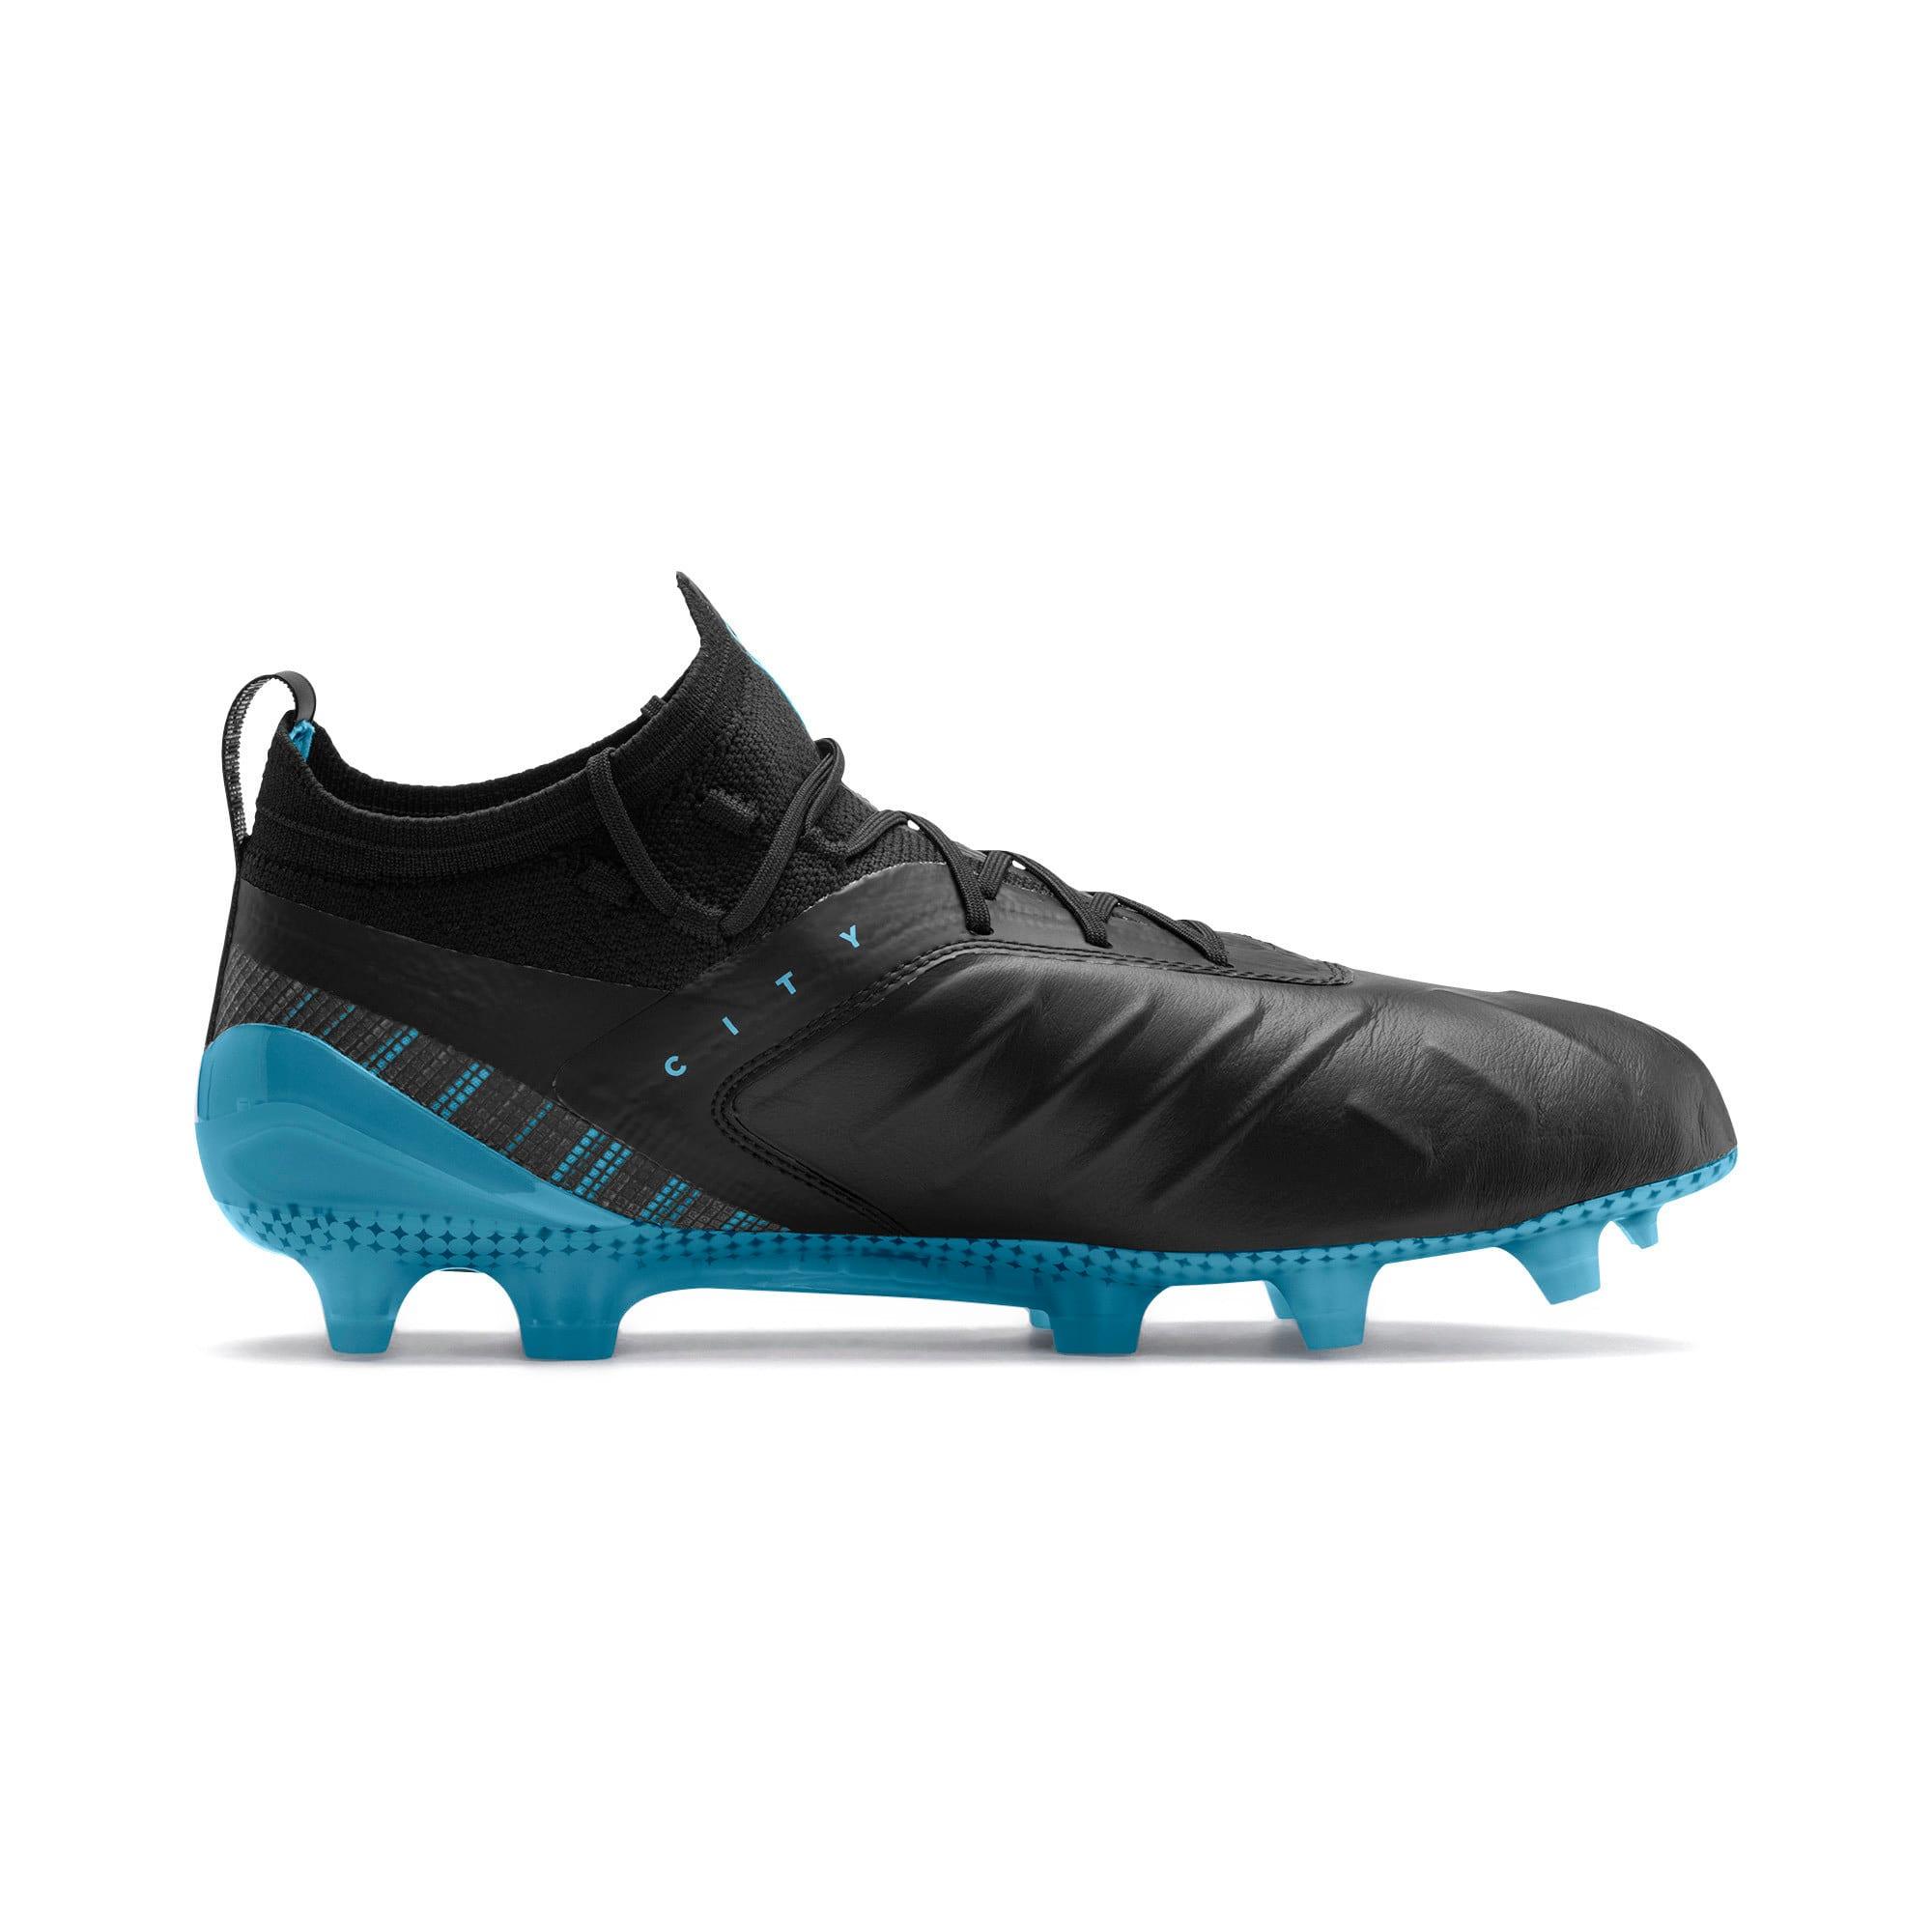 Imagen en miniatura 6 de Botas de fútbol de hombre PUMA ONE 5.1 City, Black-Sky Blue-Silver, mediana